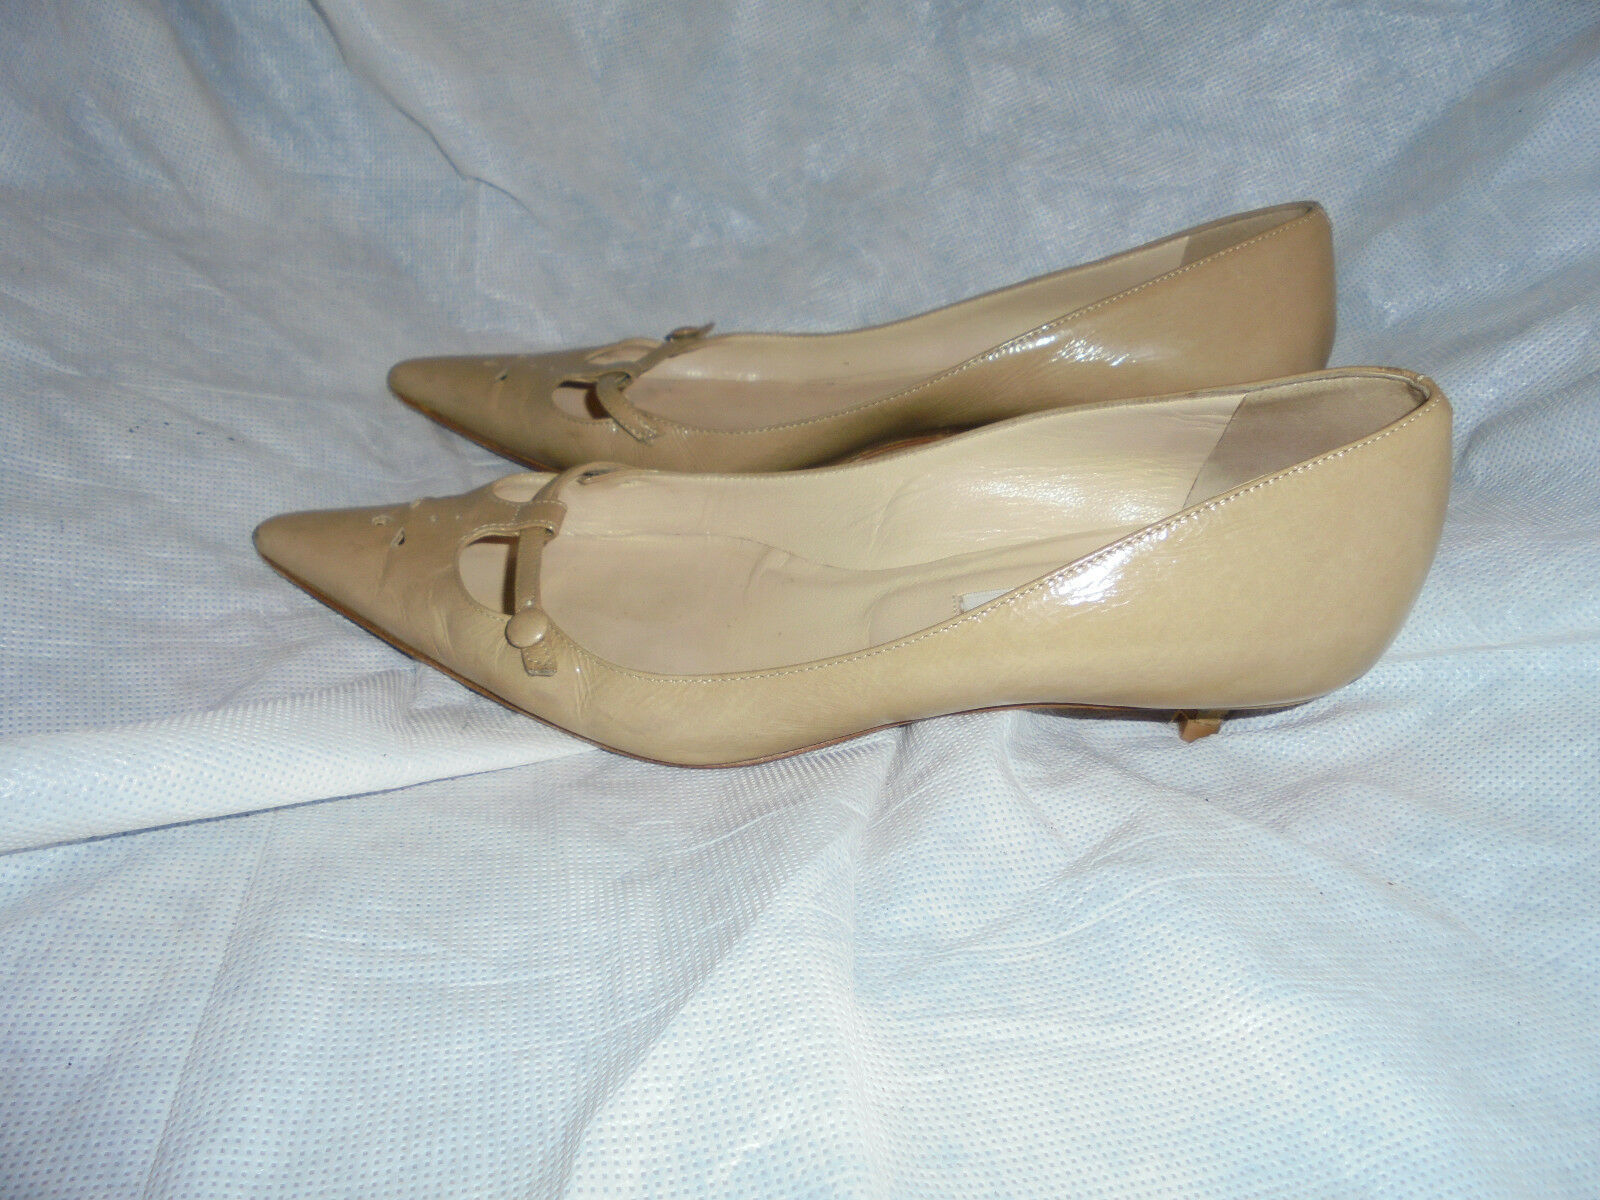 JIMMY CHOO WOMEN'S NUDE LEATHER SLIP ON Schuhe  SIZE VGC UK 5 EU 38 VGC SIZE f625a0